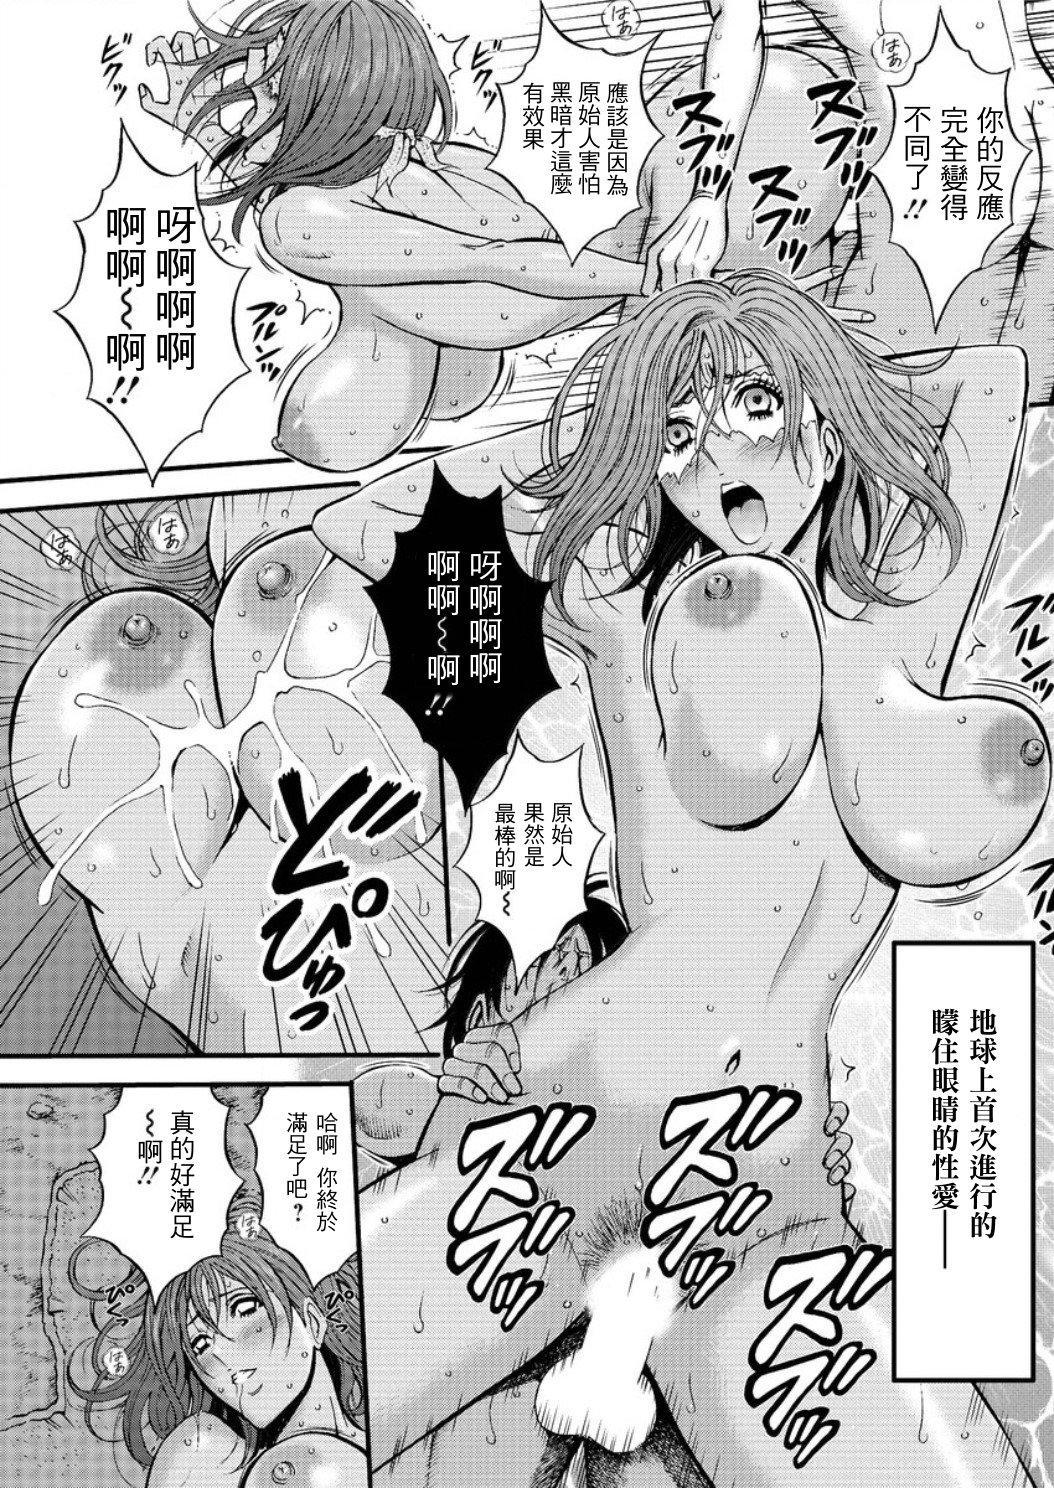 Kigenzen 10000 Nen no Ota | 史前一萬年的宅男 Ch. 19-24 87